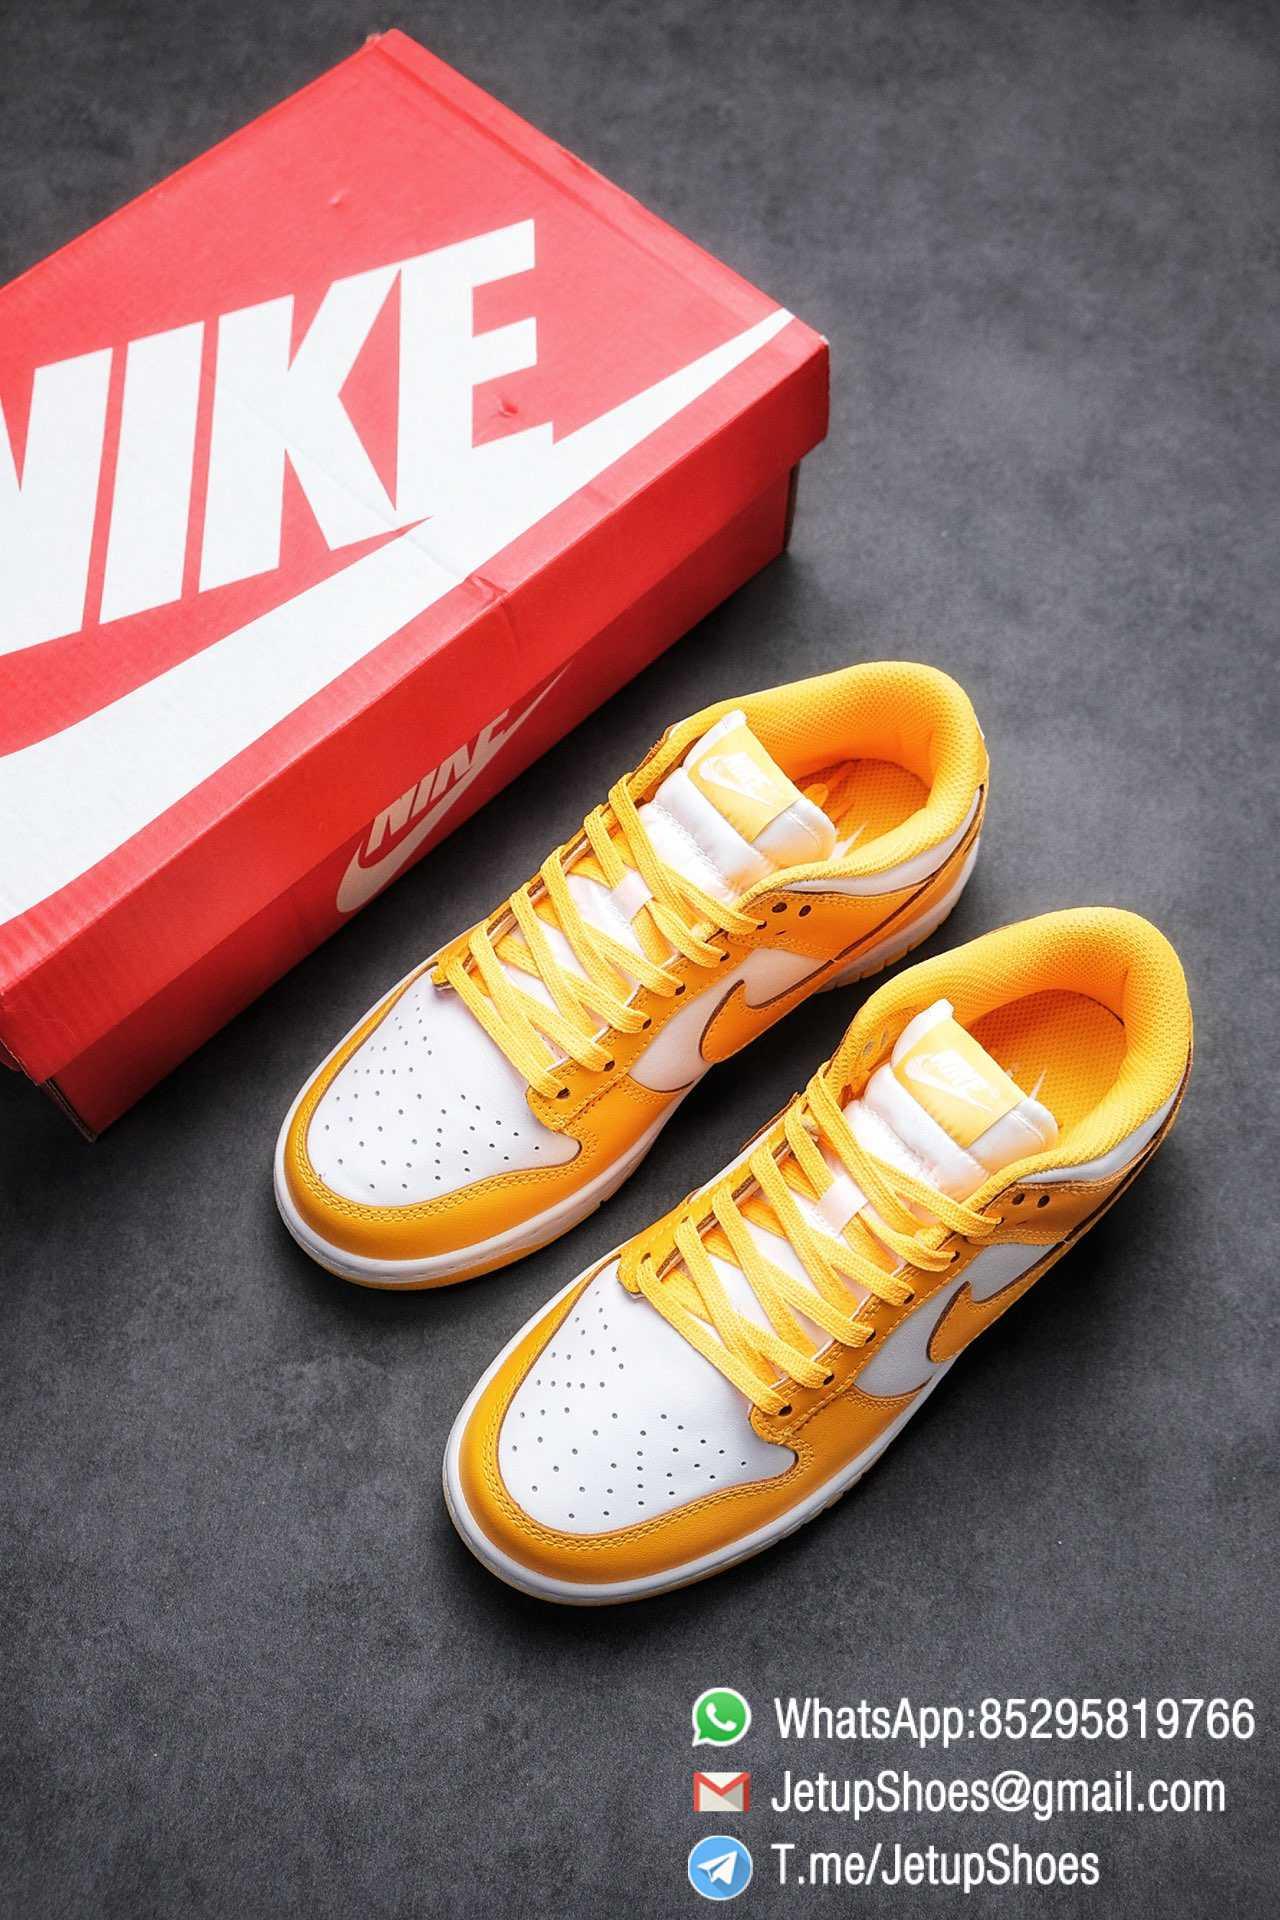 Womens Sneakers Replica Nike SB Dunk Low Laser Orange DD1503 800 Best RepSneakers 04